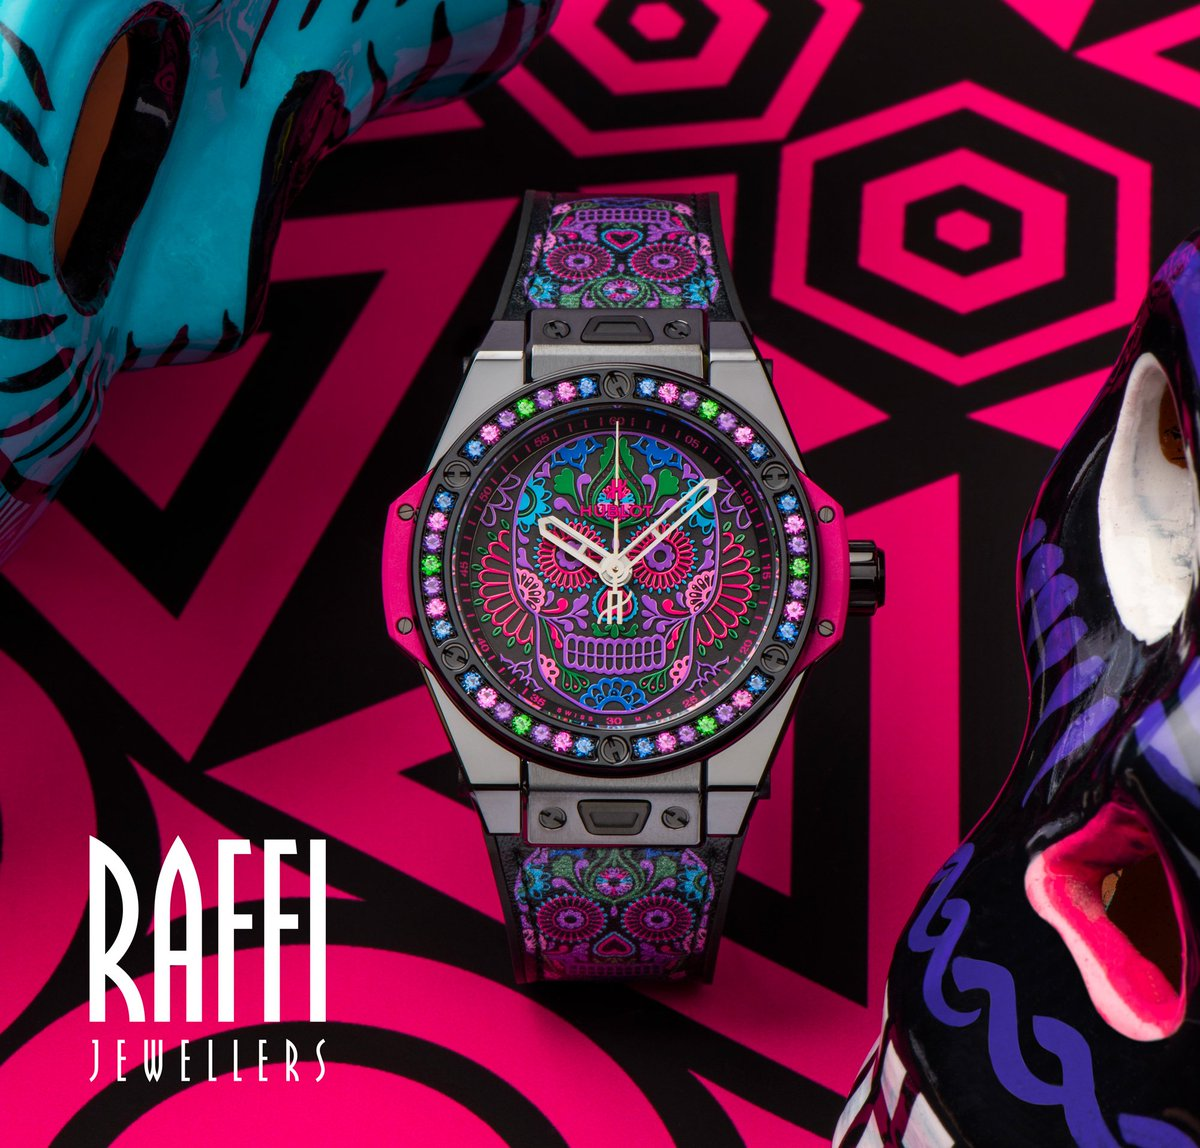 Raffi Jewellers on Twitter: